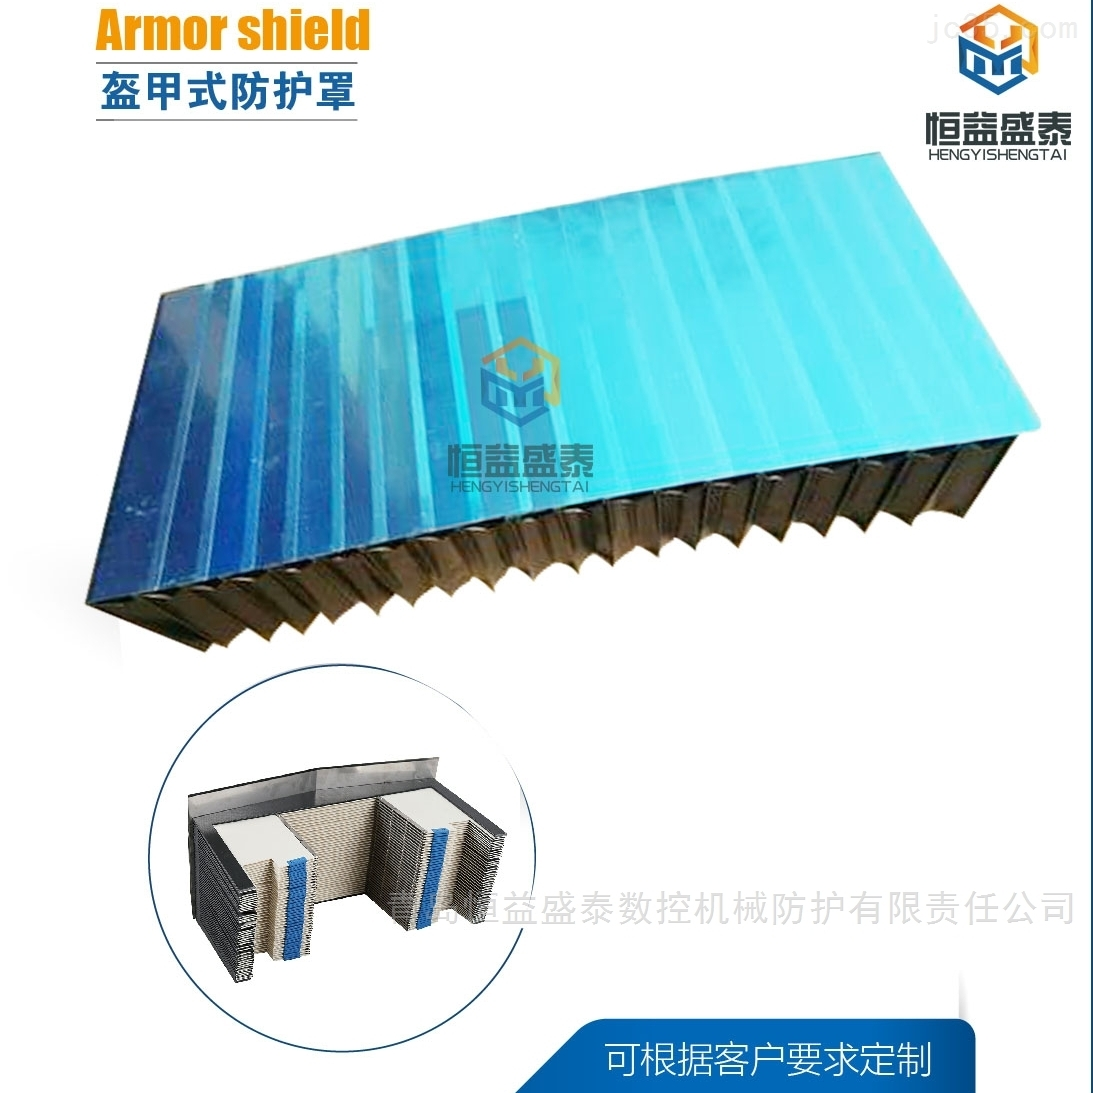 GMB20m5x龙门式加工中心柔性风琴防护罩